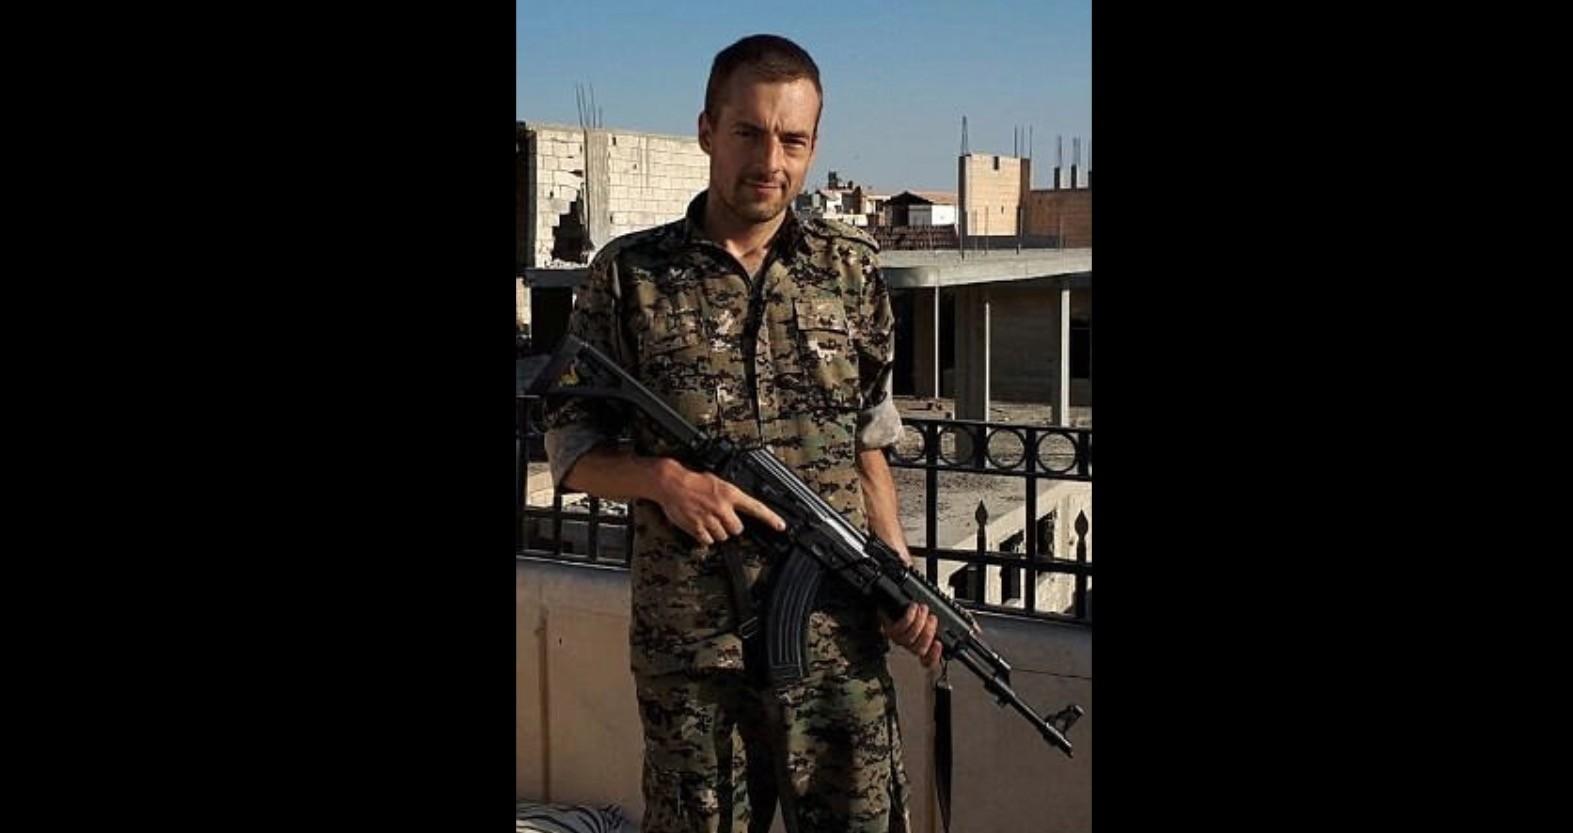 British terrorist Jamie Janson